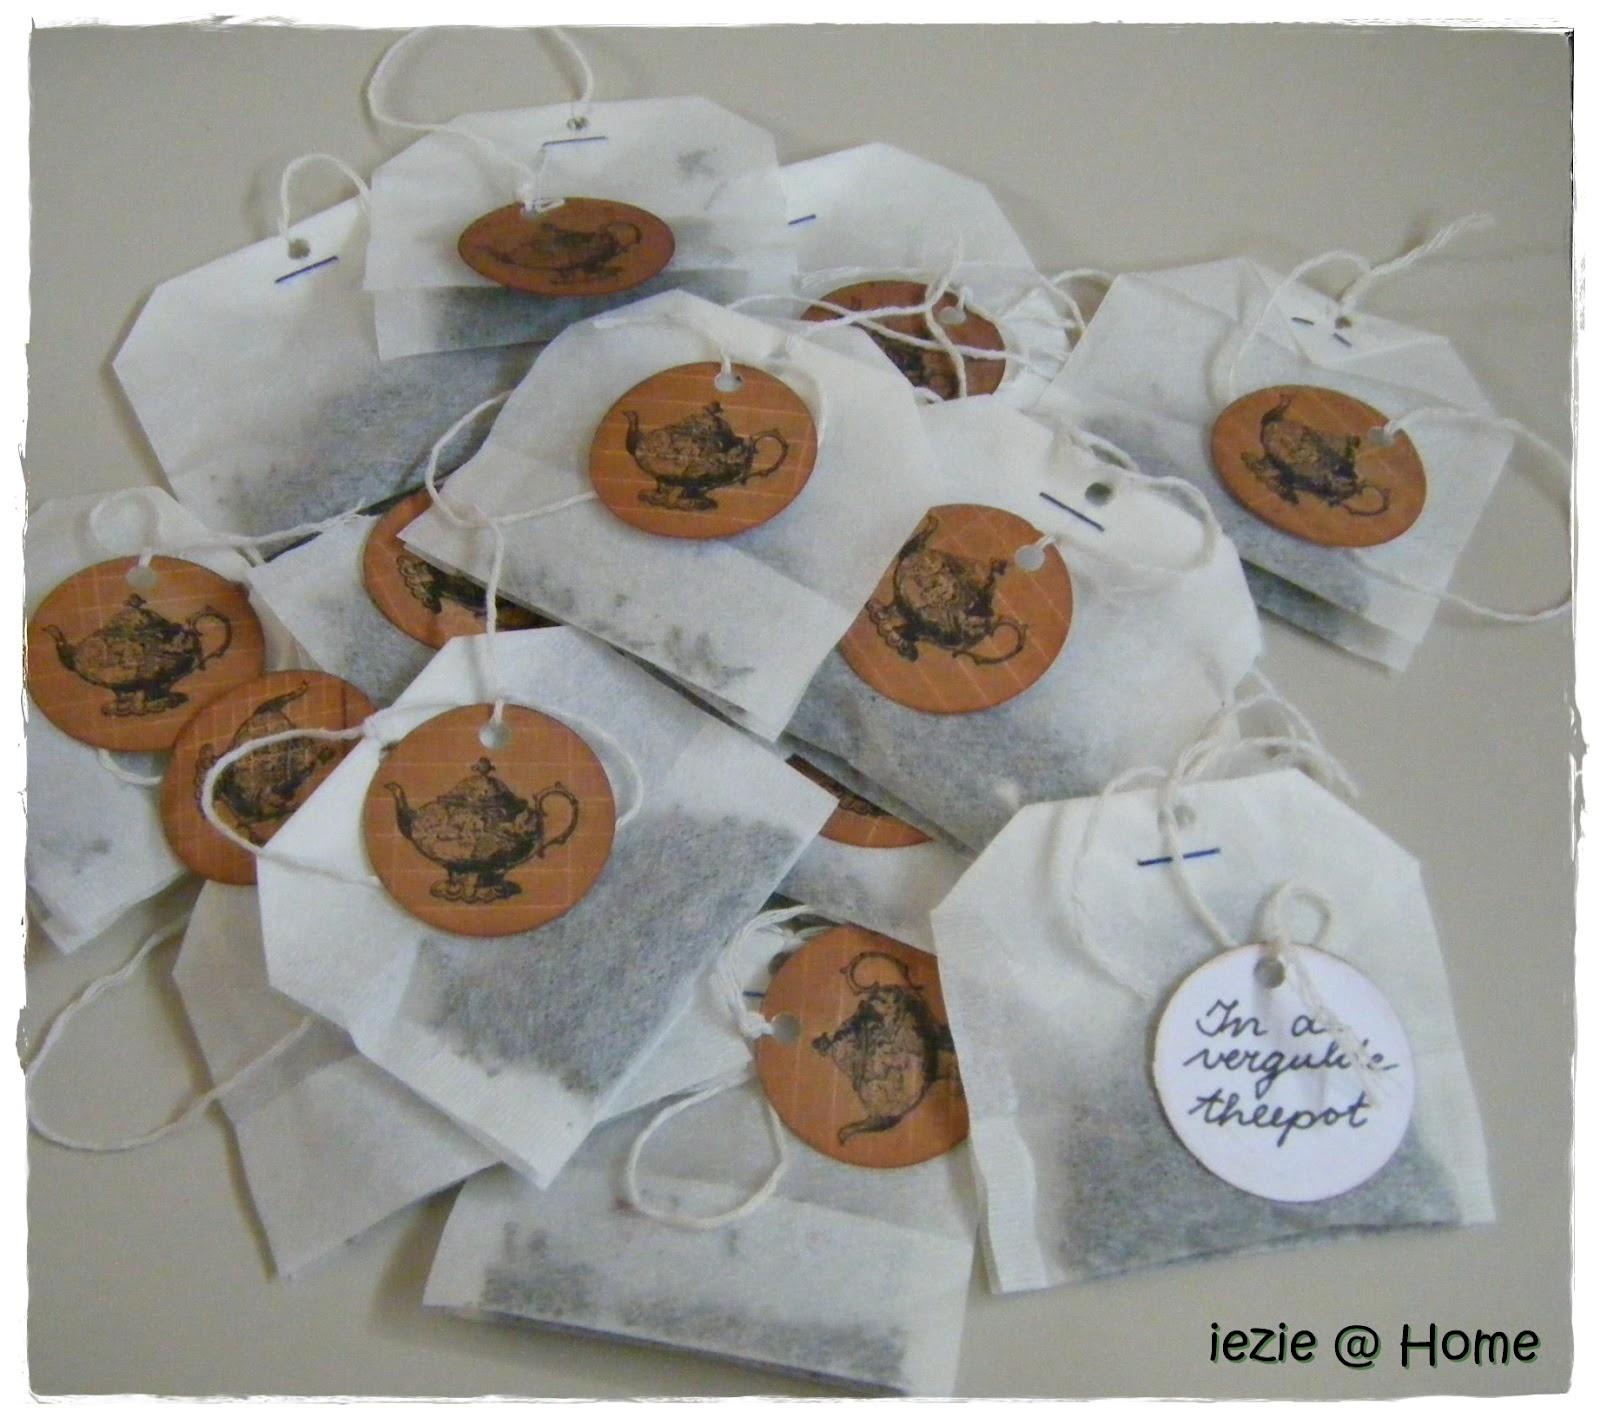 Iezie home oktober 2012 for Kleine vijverfilter zelf maken